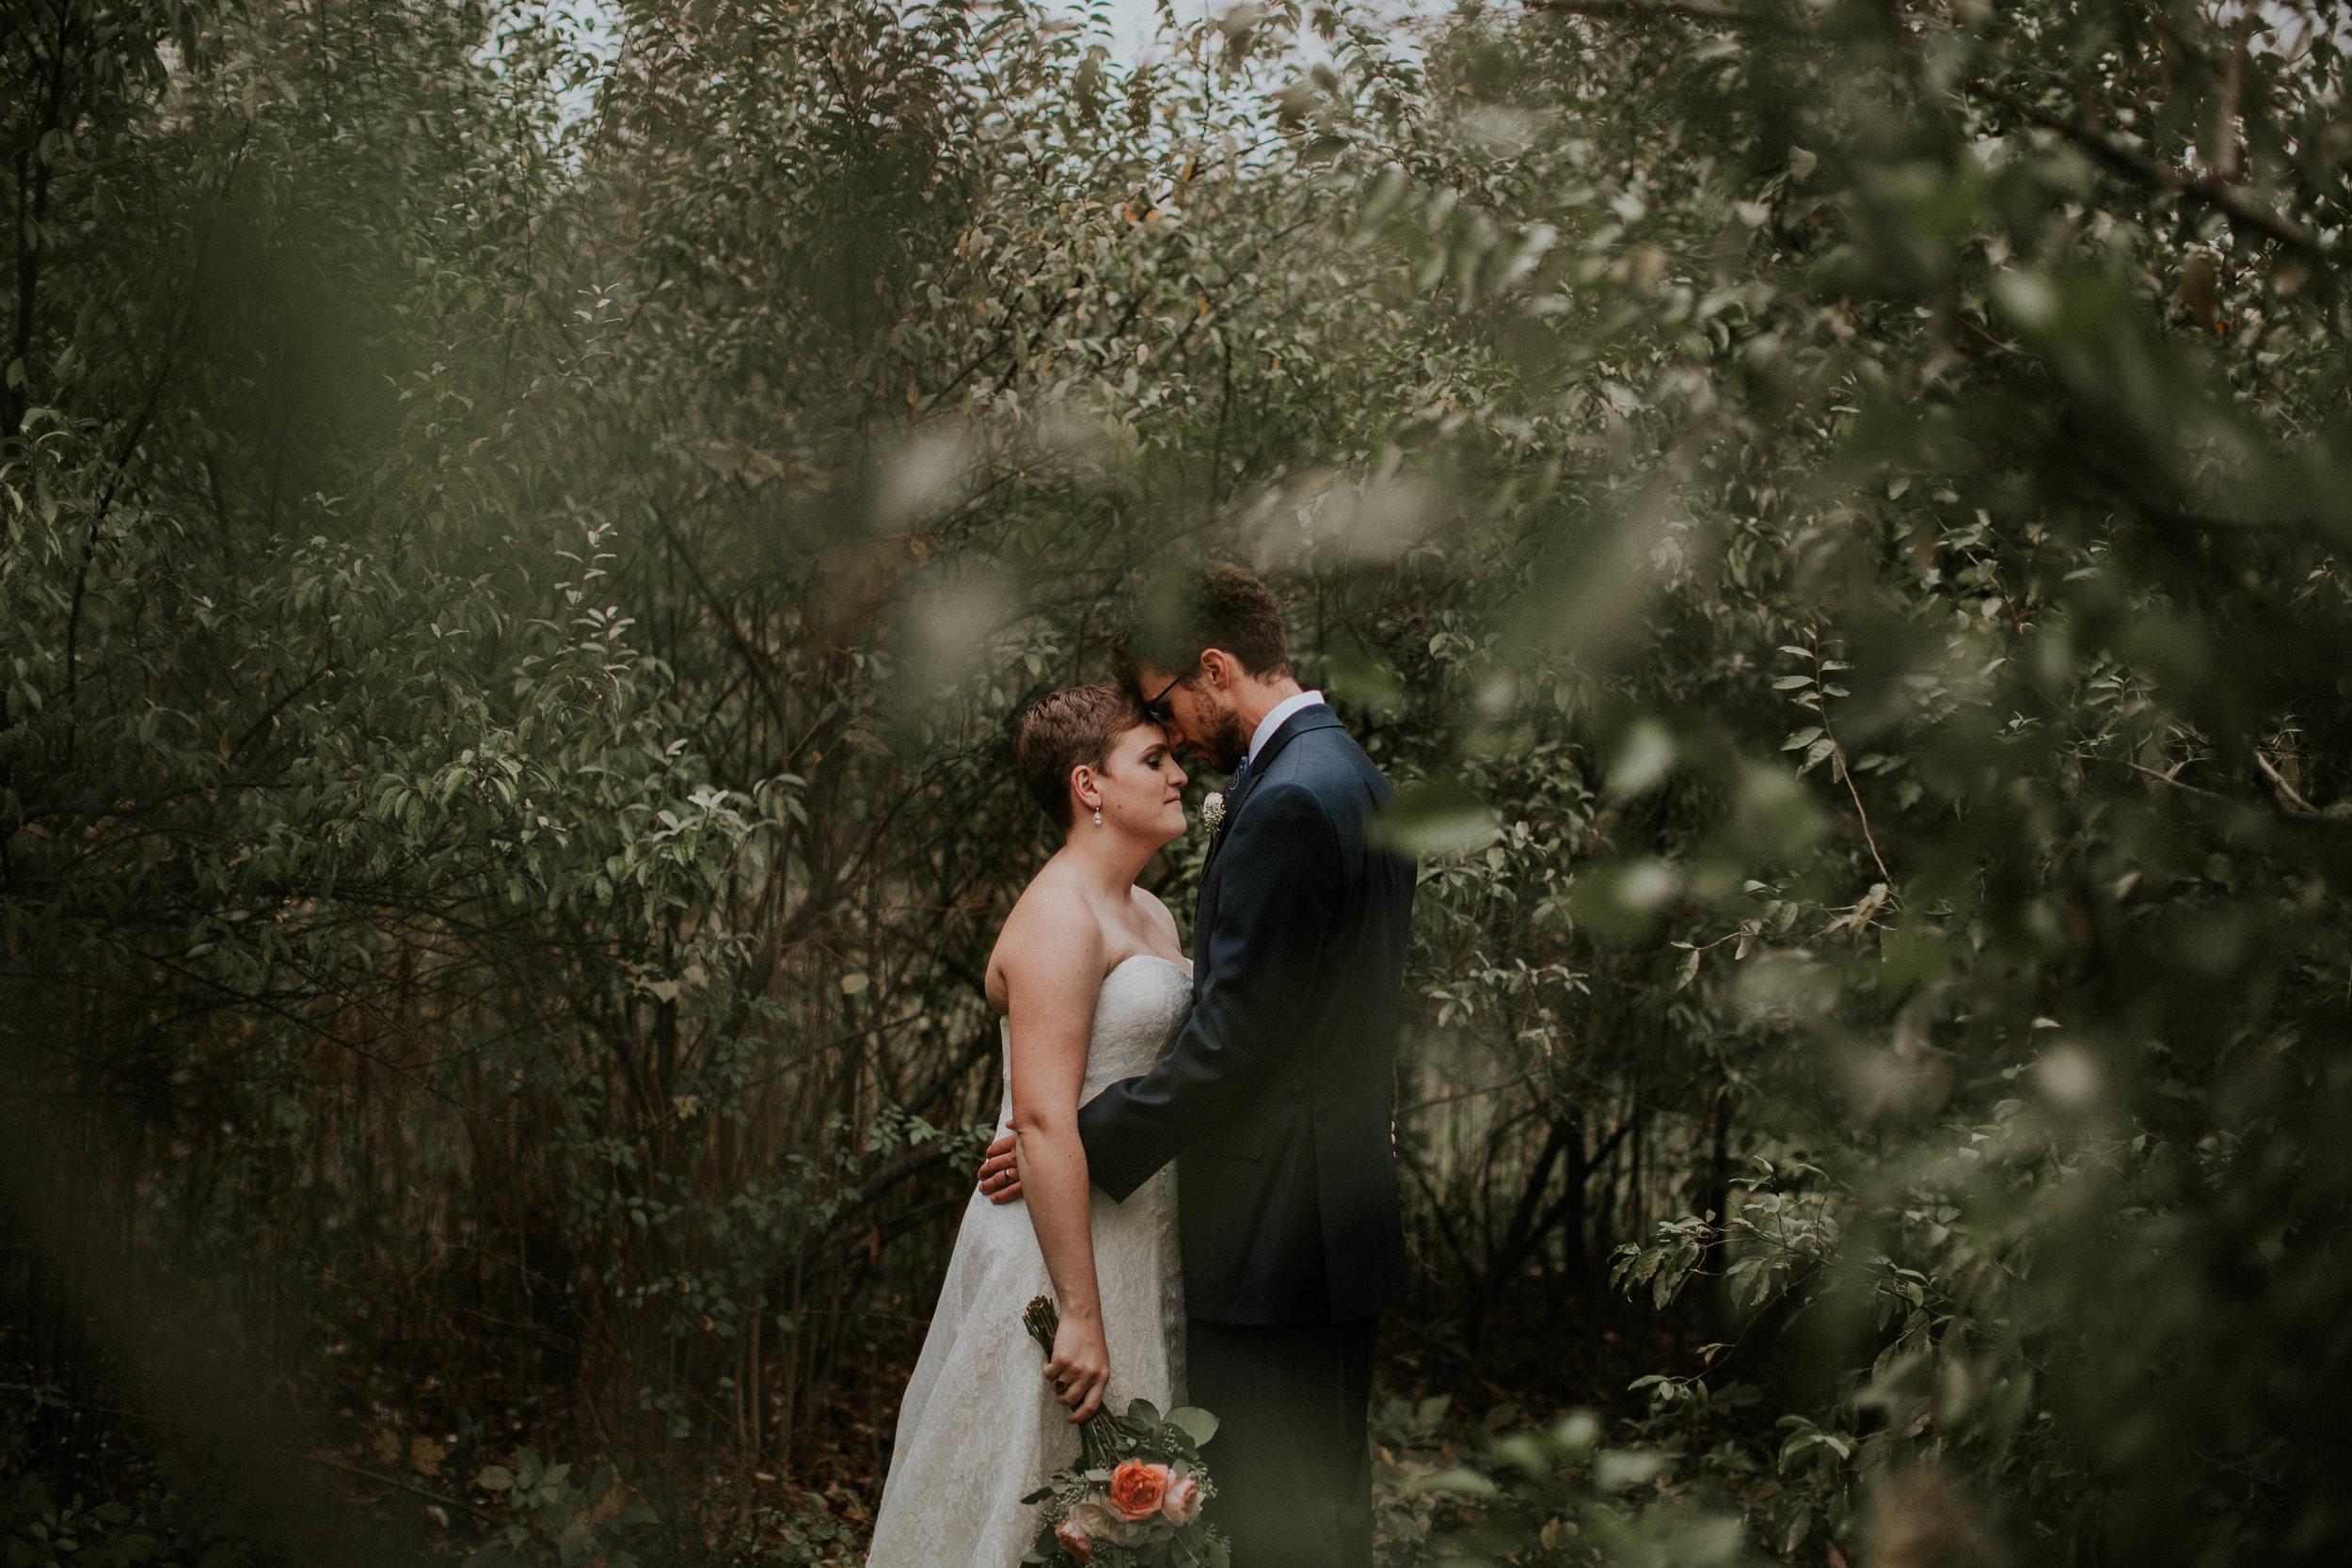 Columbus ohio wedding photographer grace e jones photography real fun joyful wedding20.jpg